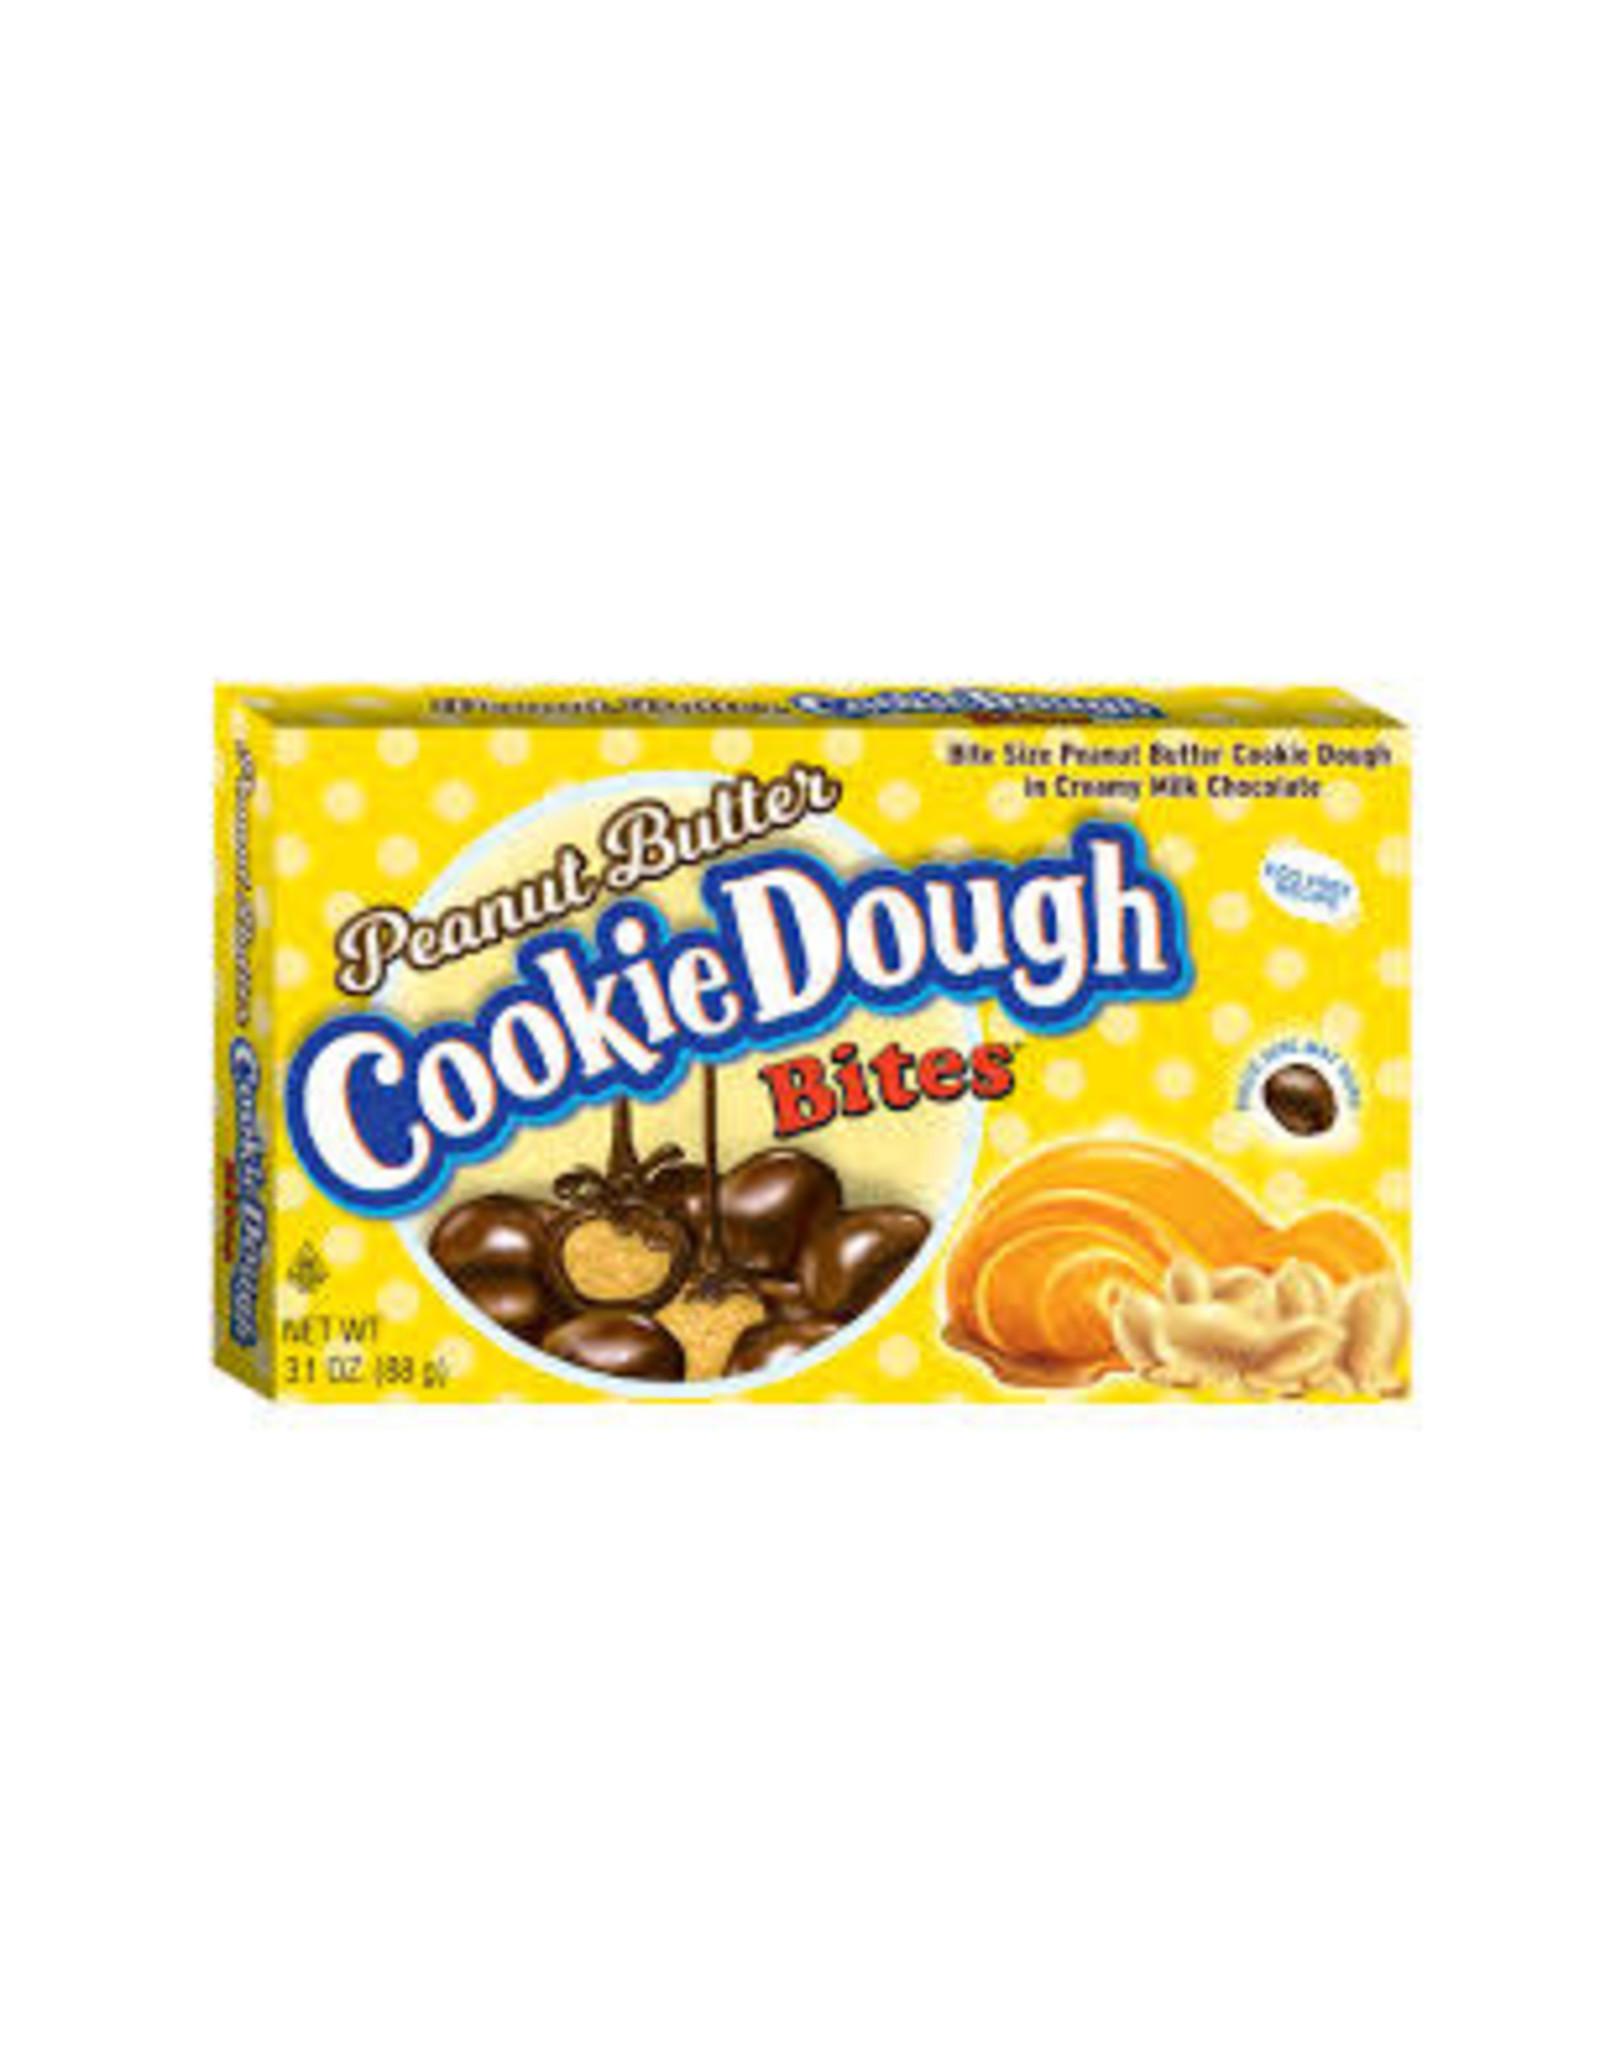 Cookie Dough Bites - Peanut Butter